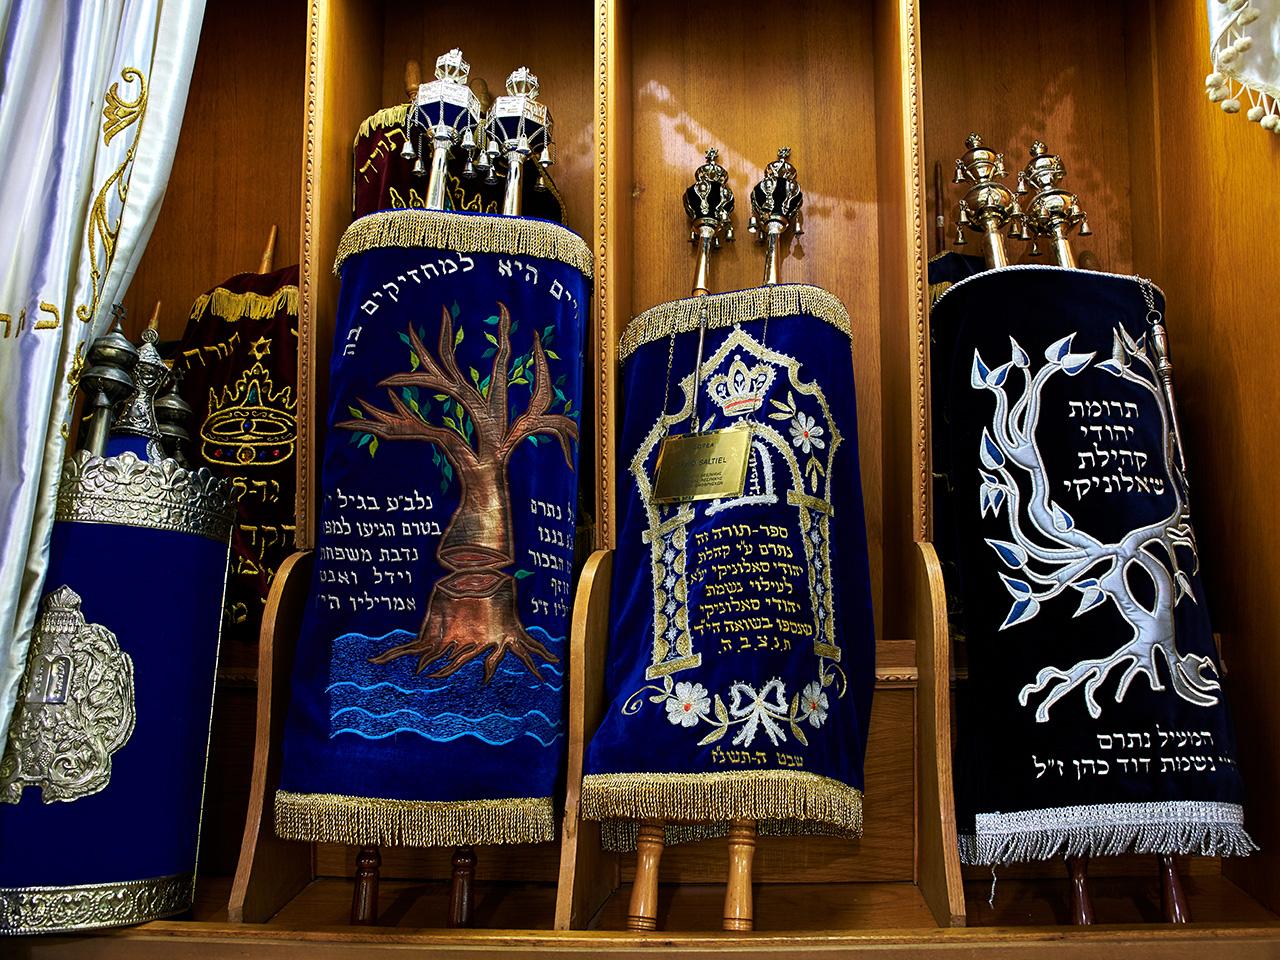 Thessaloniki Lezicaron Synagogue - Thessaloniki Jewish Tour - Greek Jewish tours in Greece - Jewish tour of Thessaloniki Greece - Jewish Greek travel packages in Greece - Atlantis Travel Agency in Greece